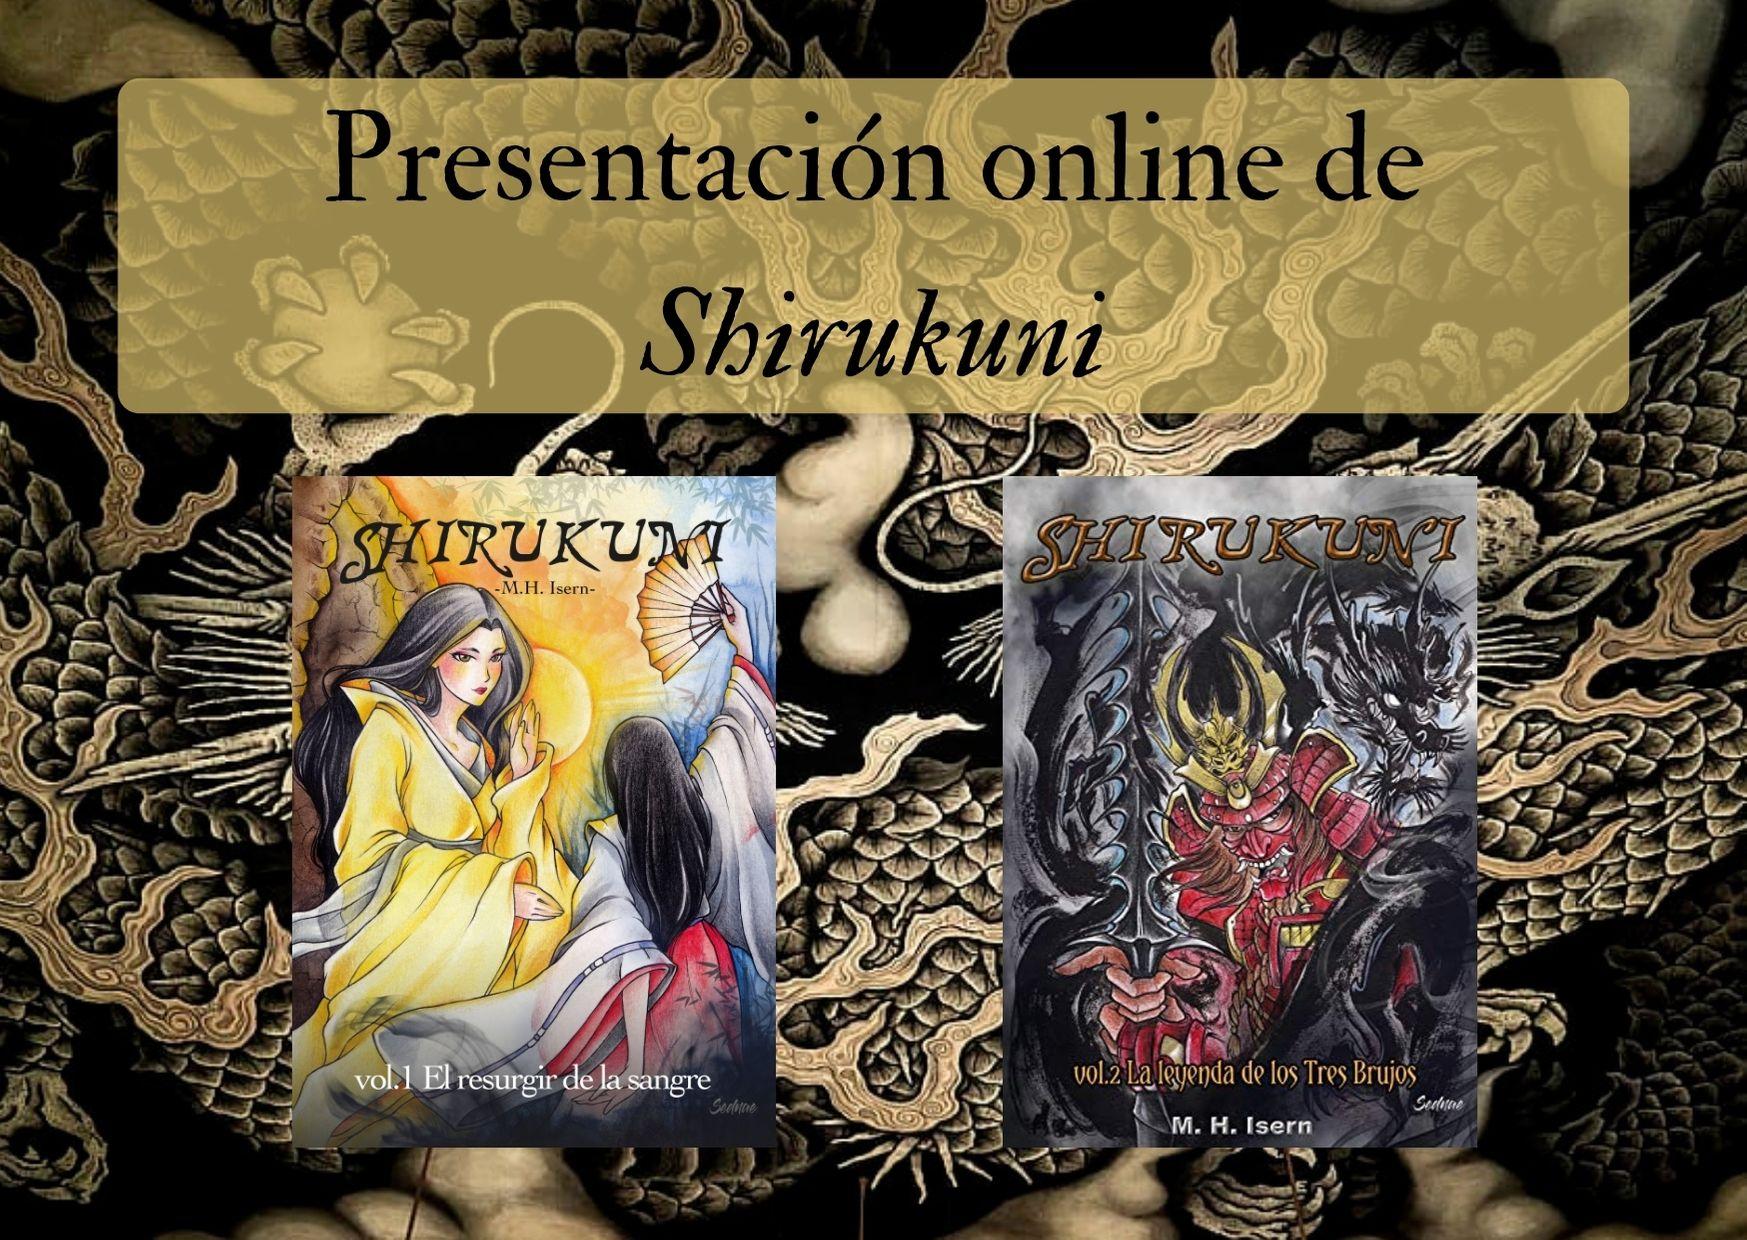 ¡Presentación online de Shirukuni!